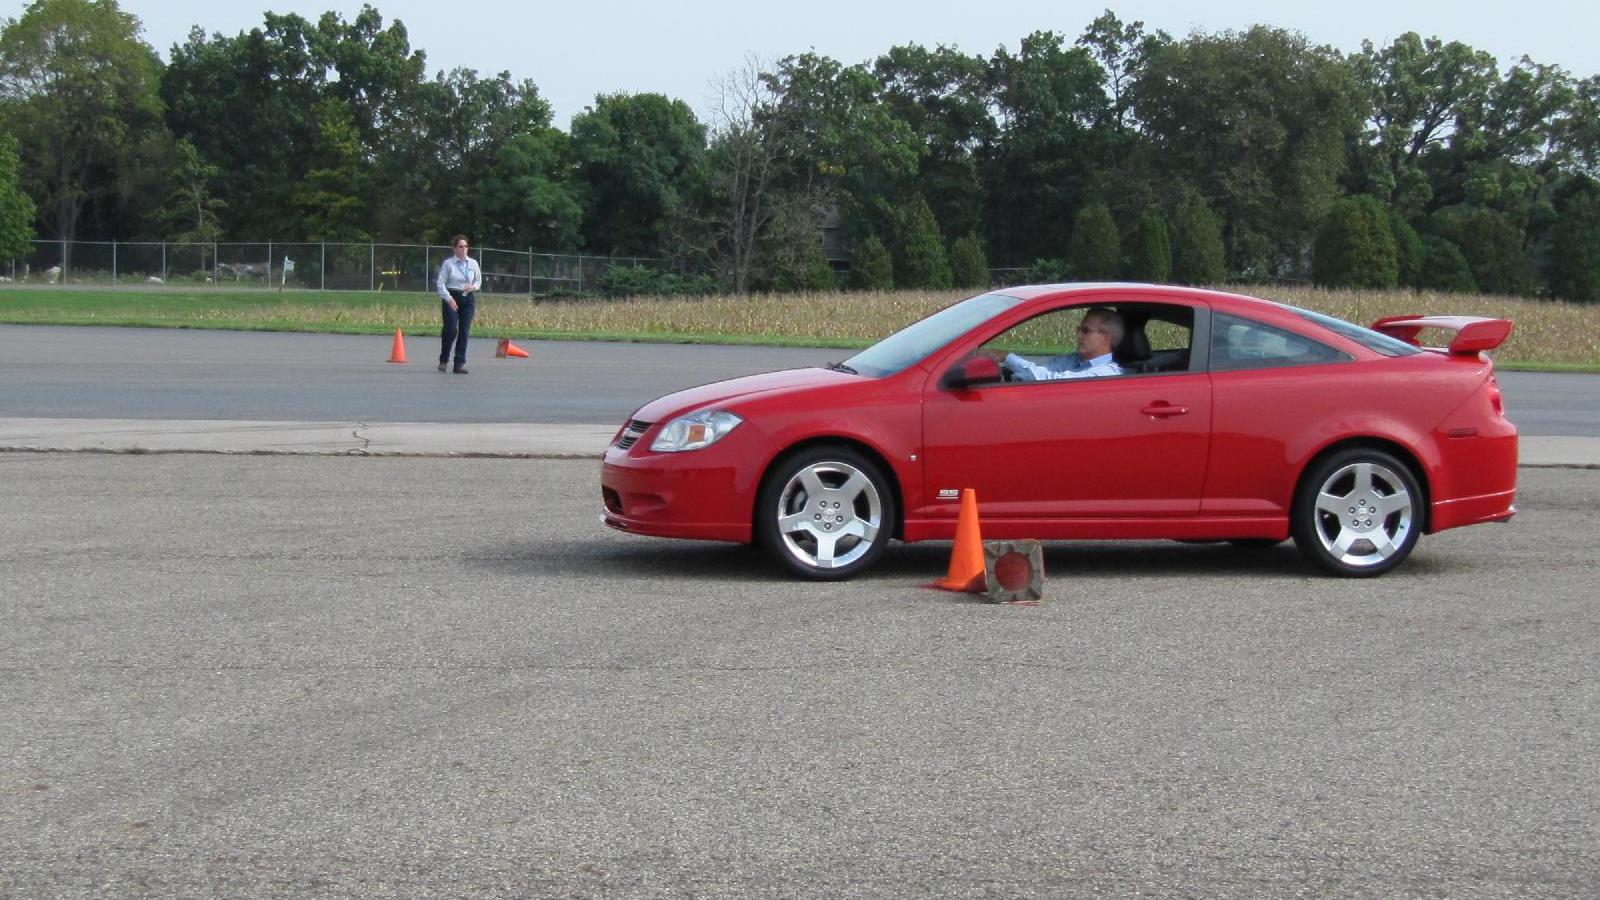 Eaton technologies test day, Marshall, Michigan, Sept 2010